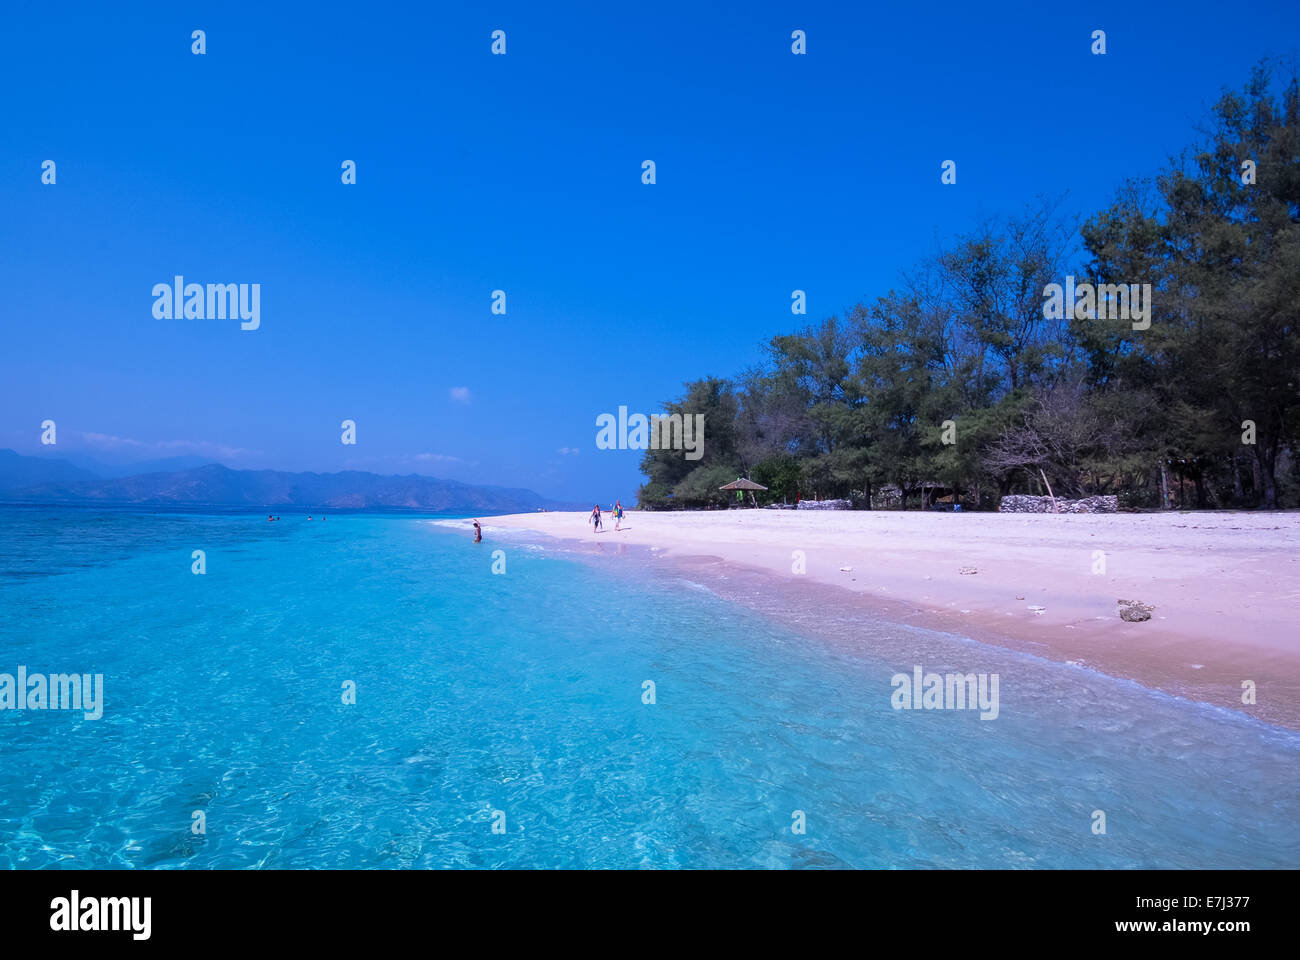 gili's islands at Lombok, Indonesia Stock Photo